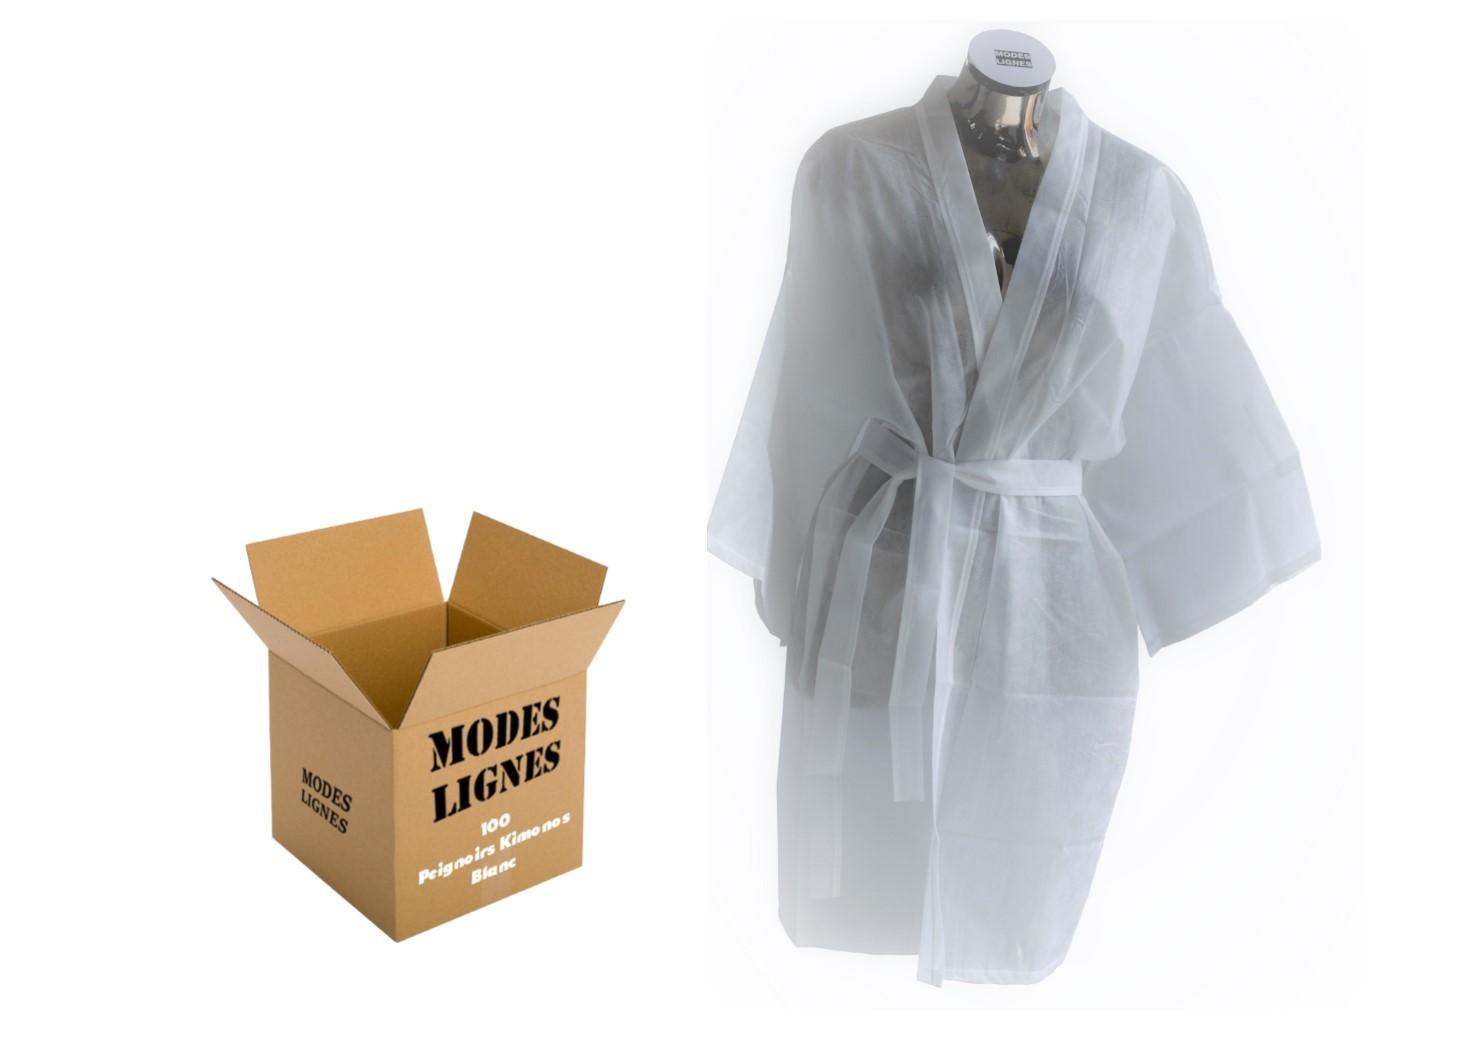 Peignoir Jetable Kimono Usage Unique Non Tisse Thalasso Spa Piscine Institut Beaute Soin Corps